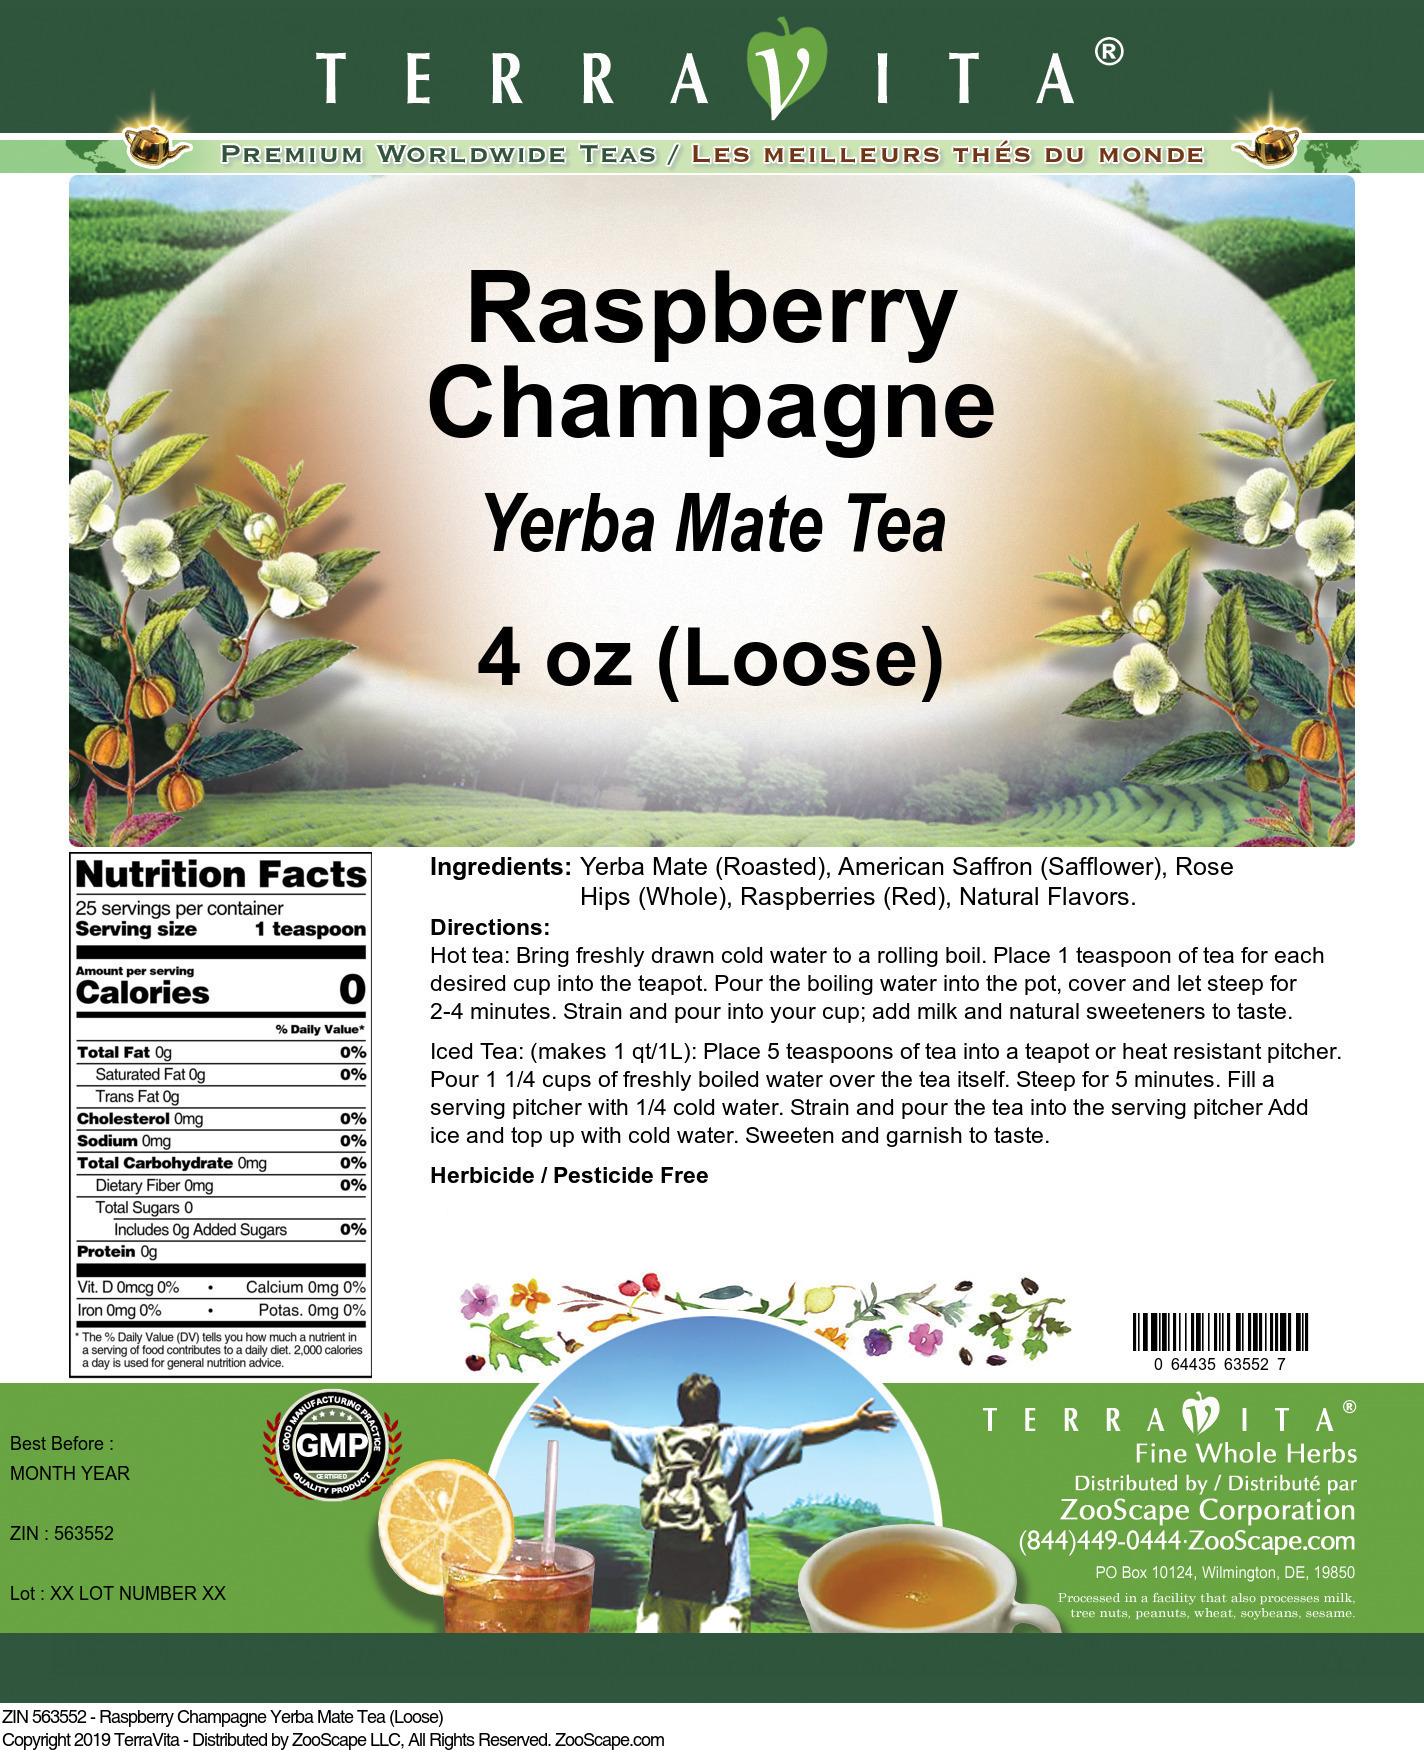 Raspberry Champagne Yerba Mate